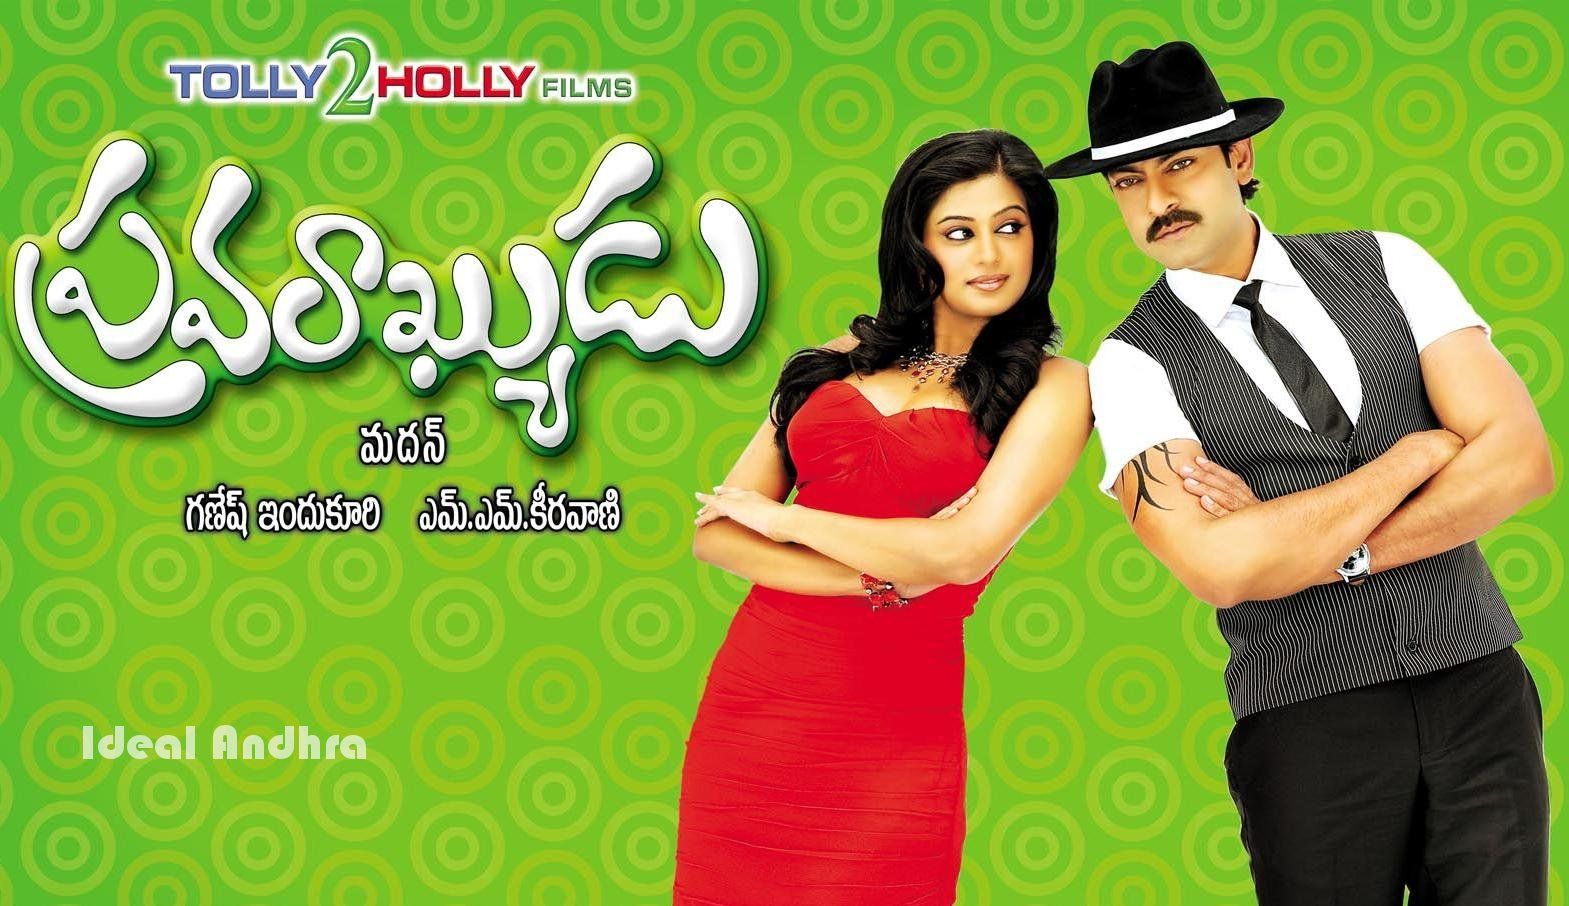 Pravarakyudu telugu movie songs free download / Paper heart movie stream